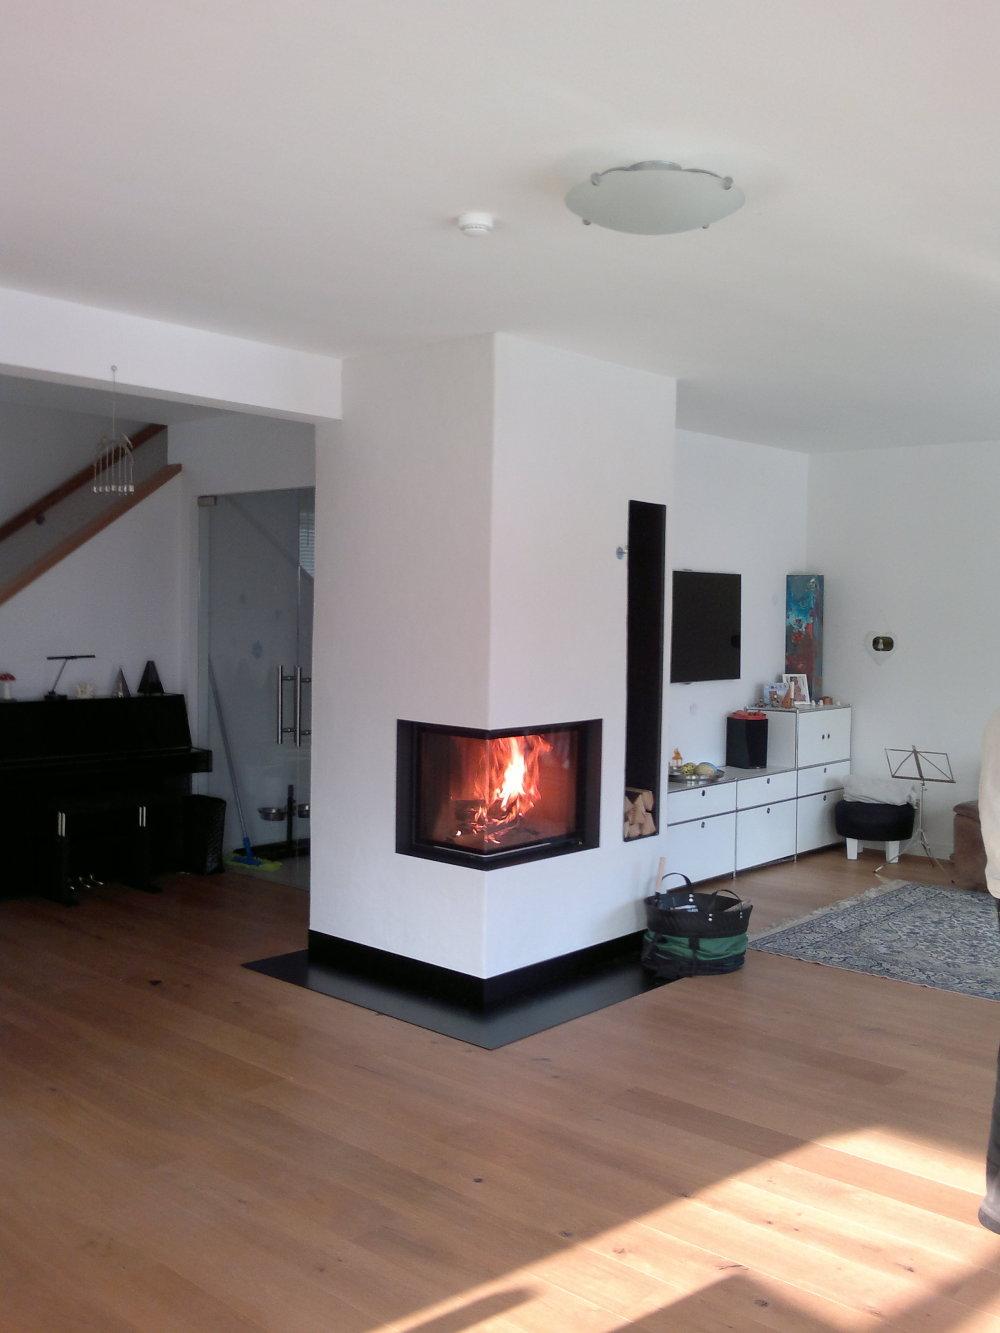 kachelofen umbauen offener kamin umbauen im kachelofen so. Black Bedroom Furniture Sets. Home Design Ideas